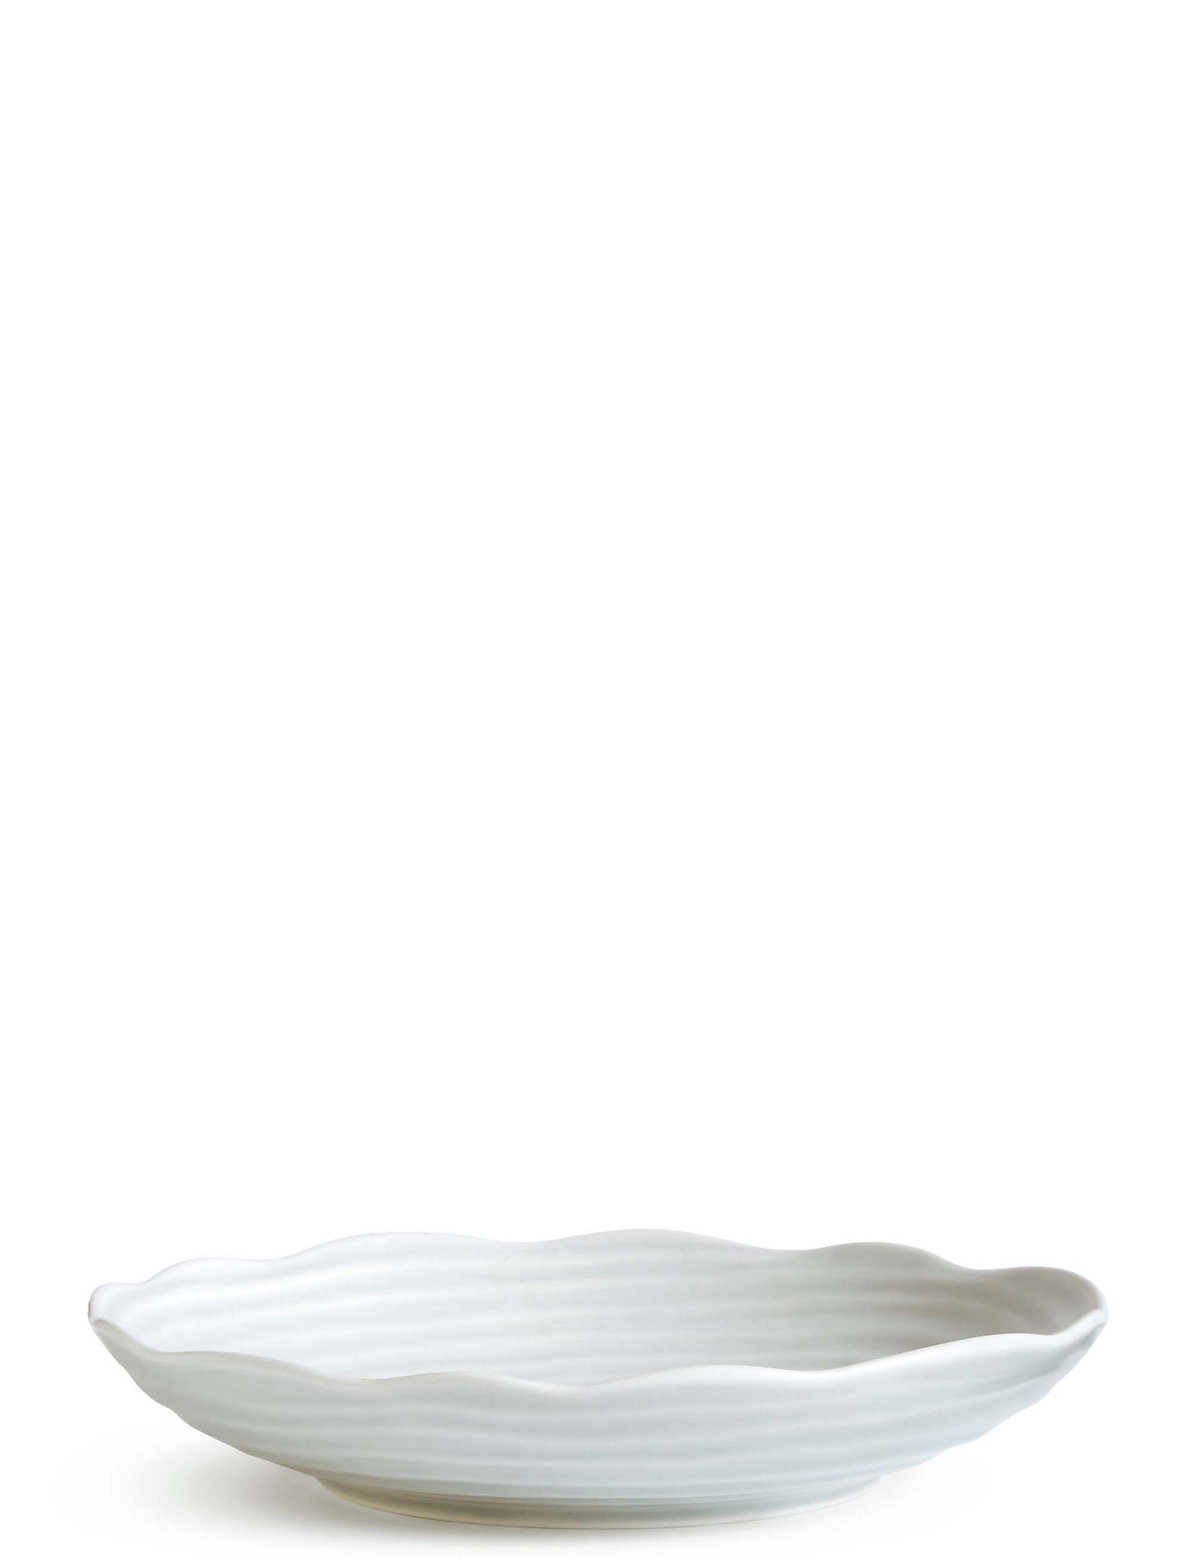 Ripple Pasta Bowl